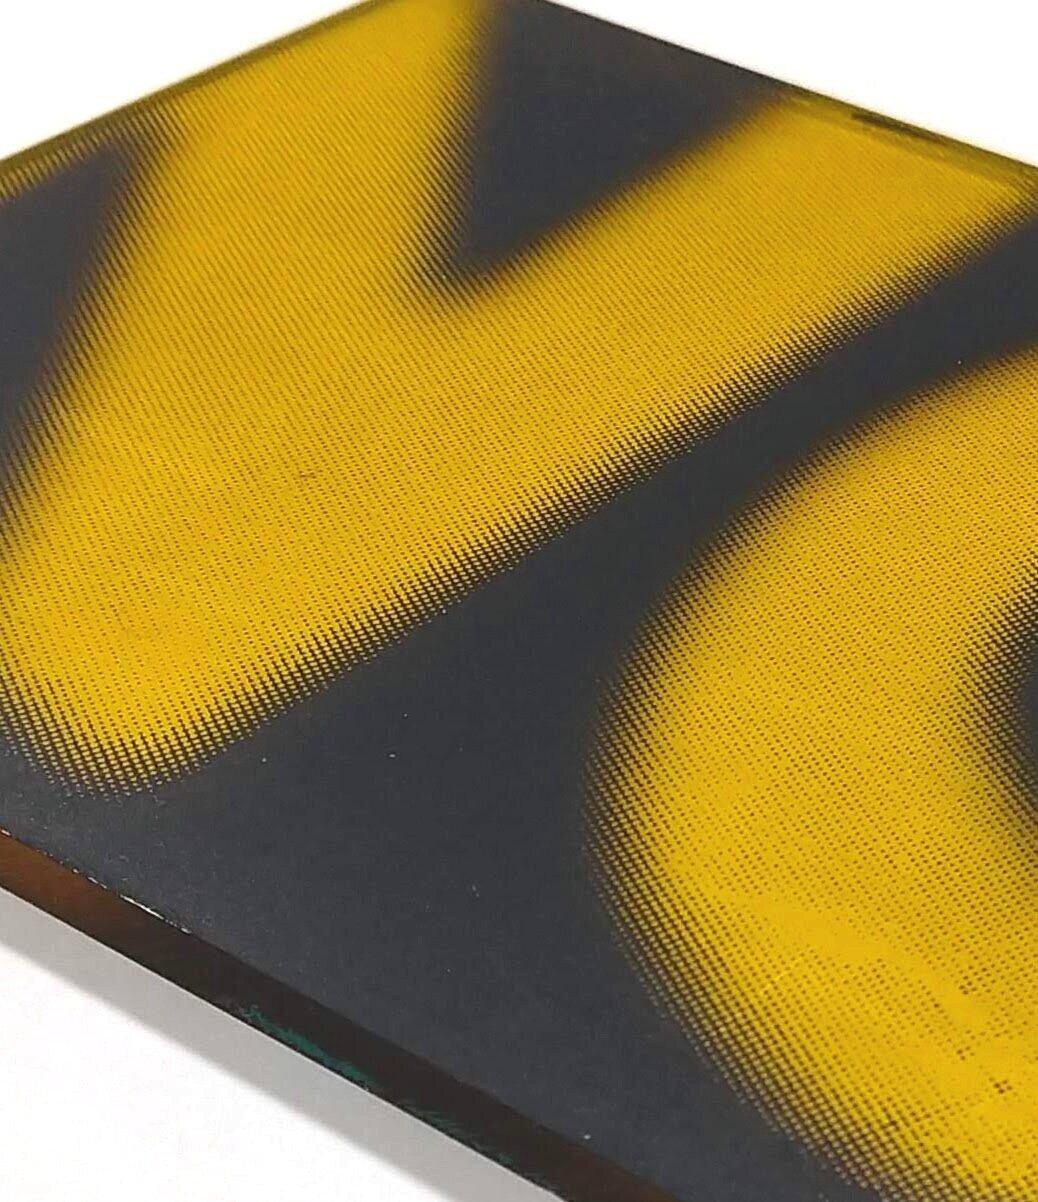 "NO  detail  Silkscreen on acrylic sheet  5x7.5x.25"""